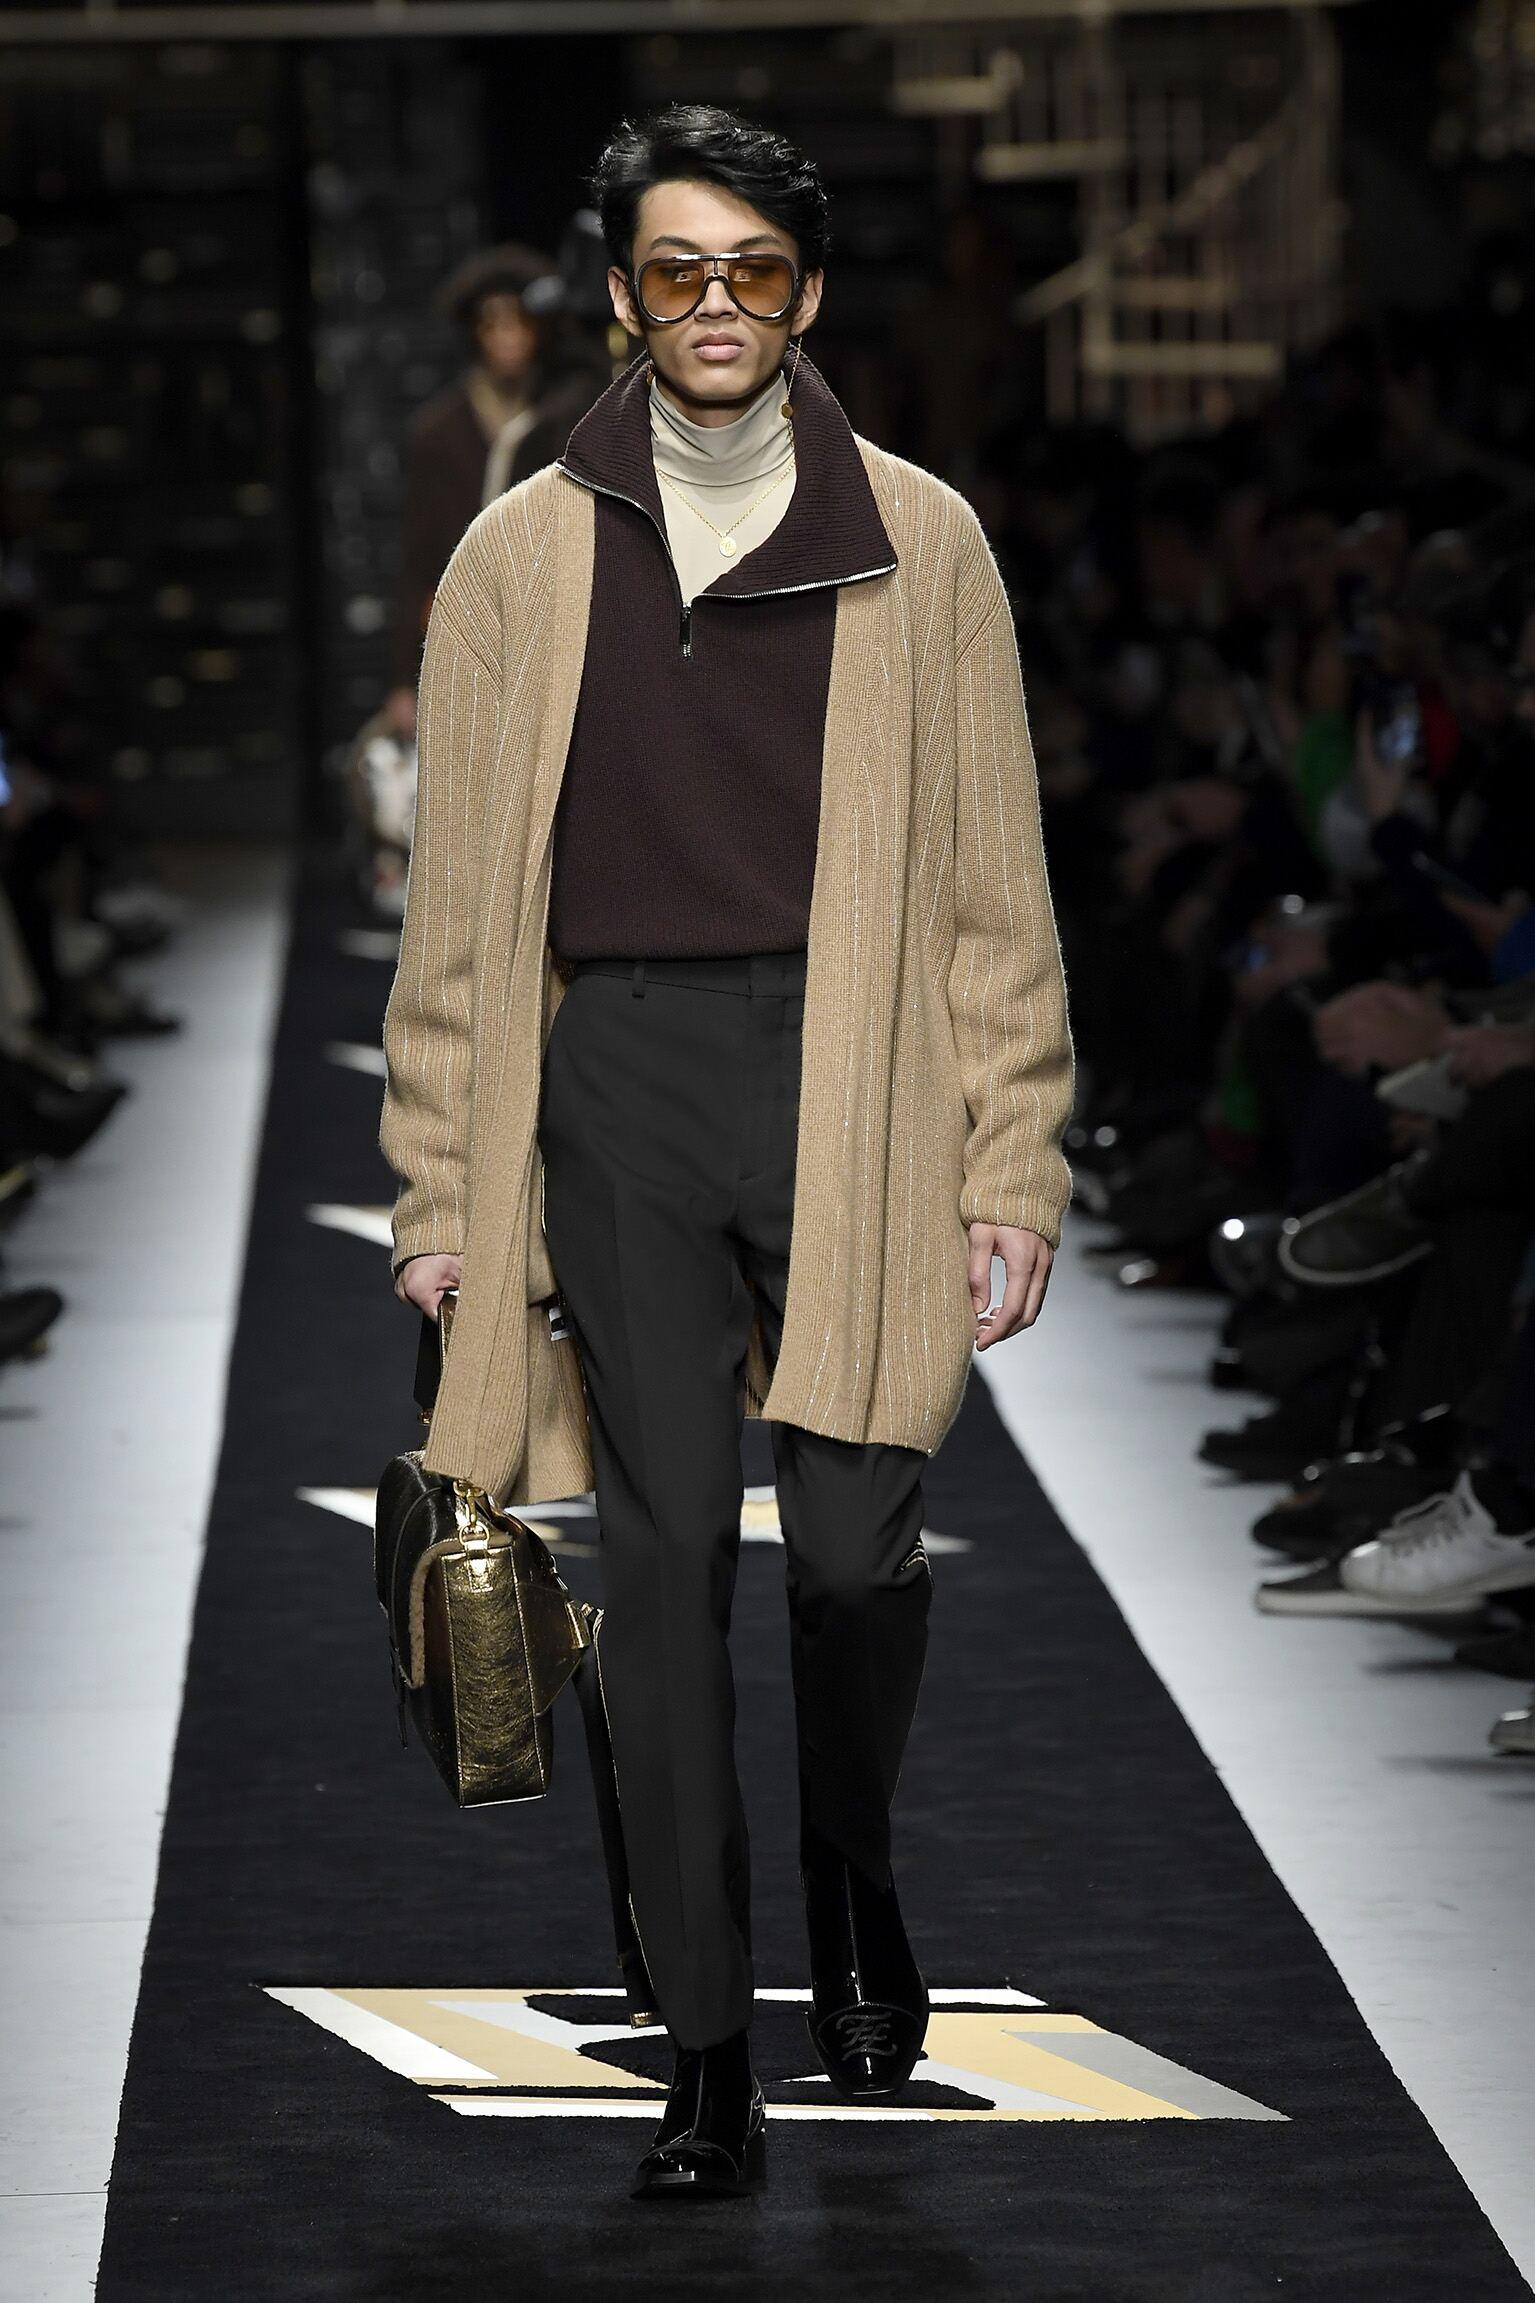 Fashion Show Man Model Fendi Catwalk